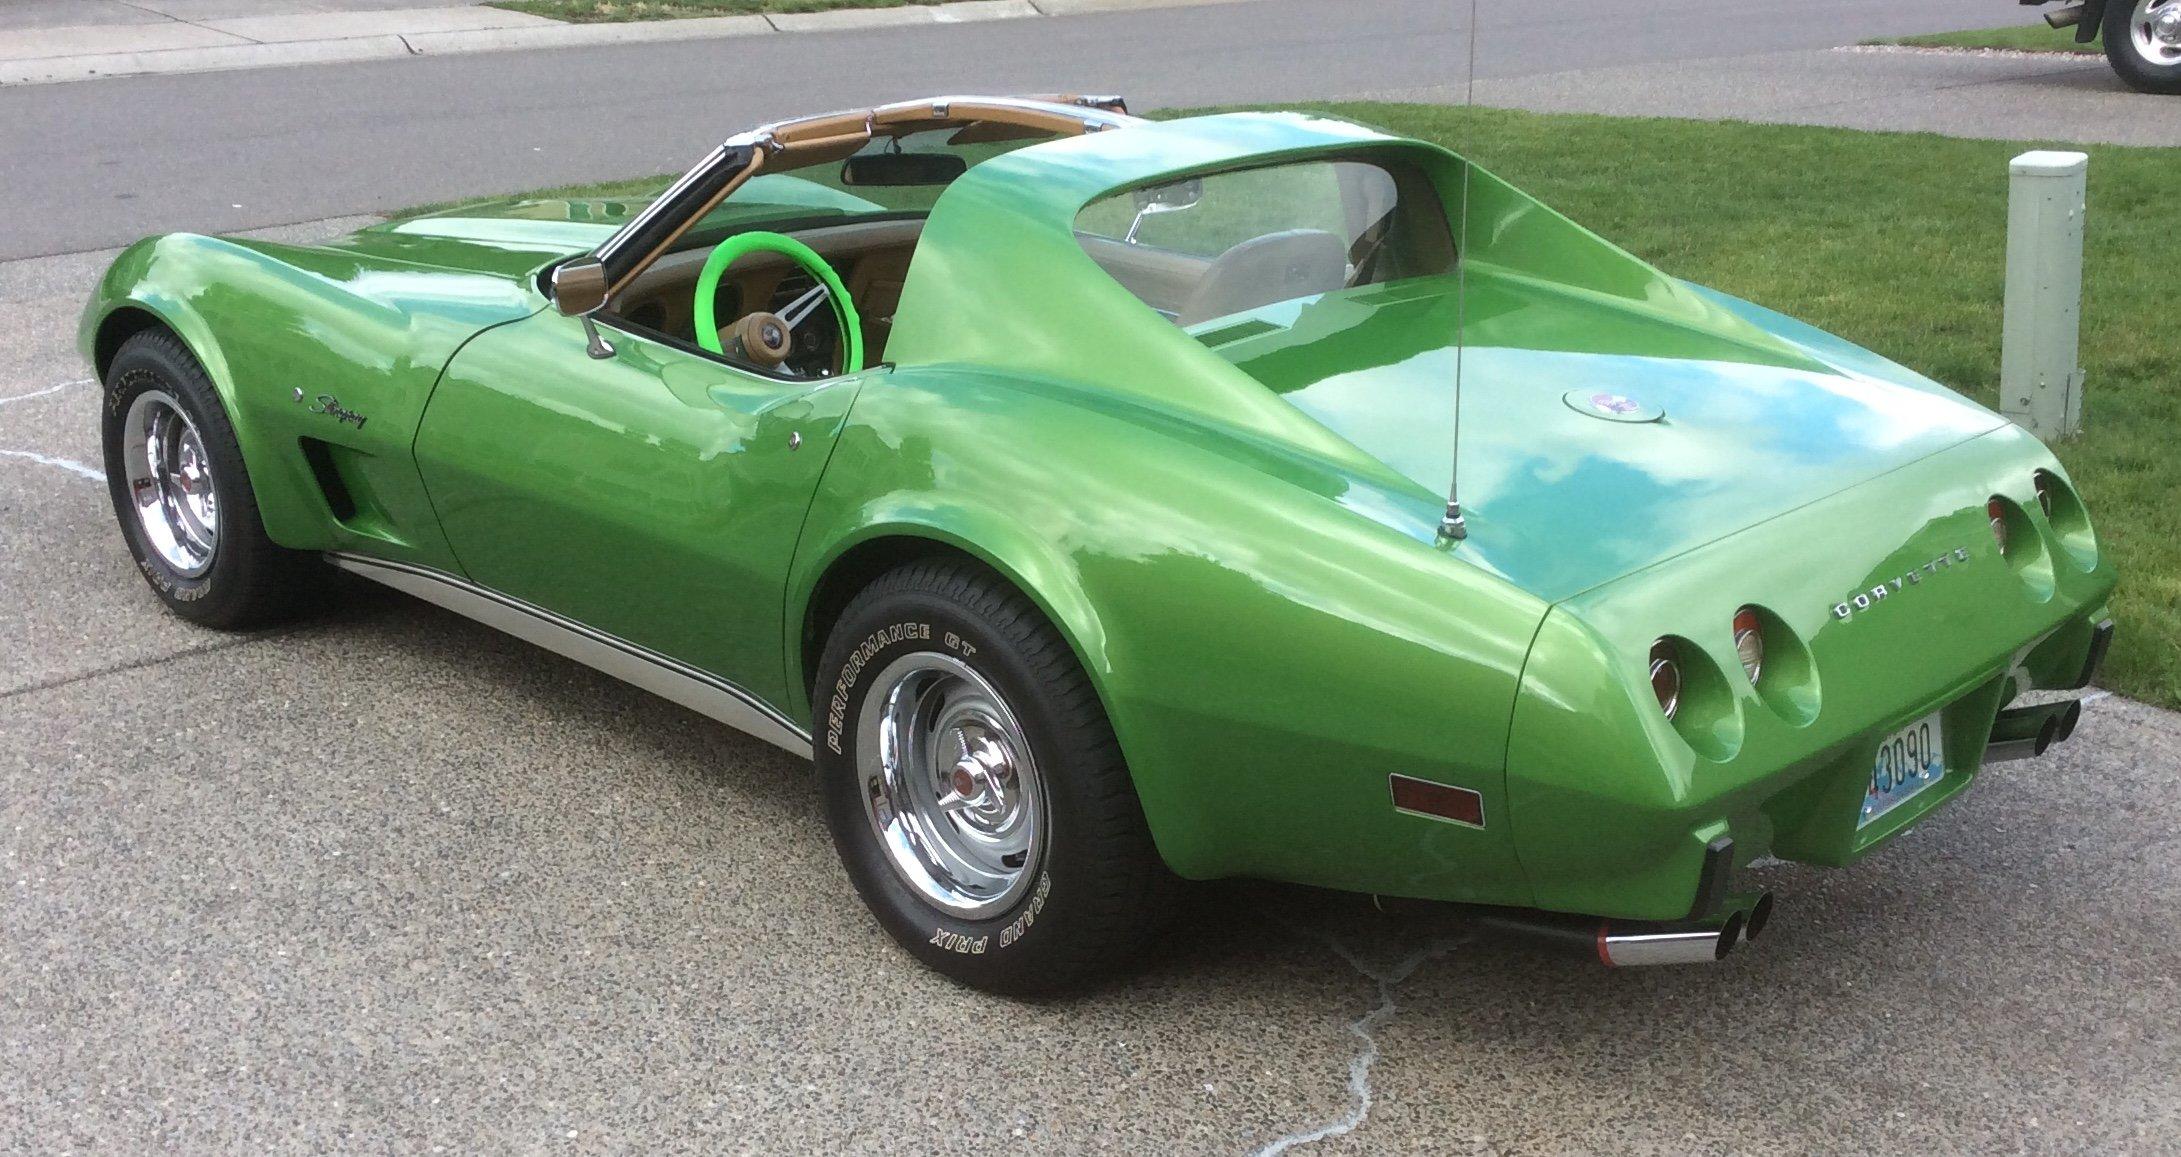 1975 Chevrolet Corvette Coupe For Sale (picture 2 of 4)